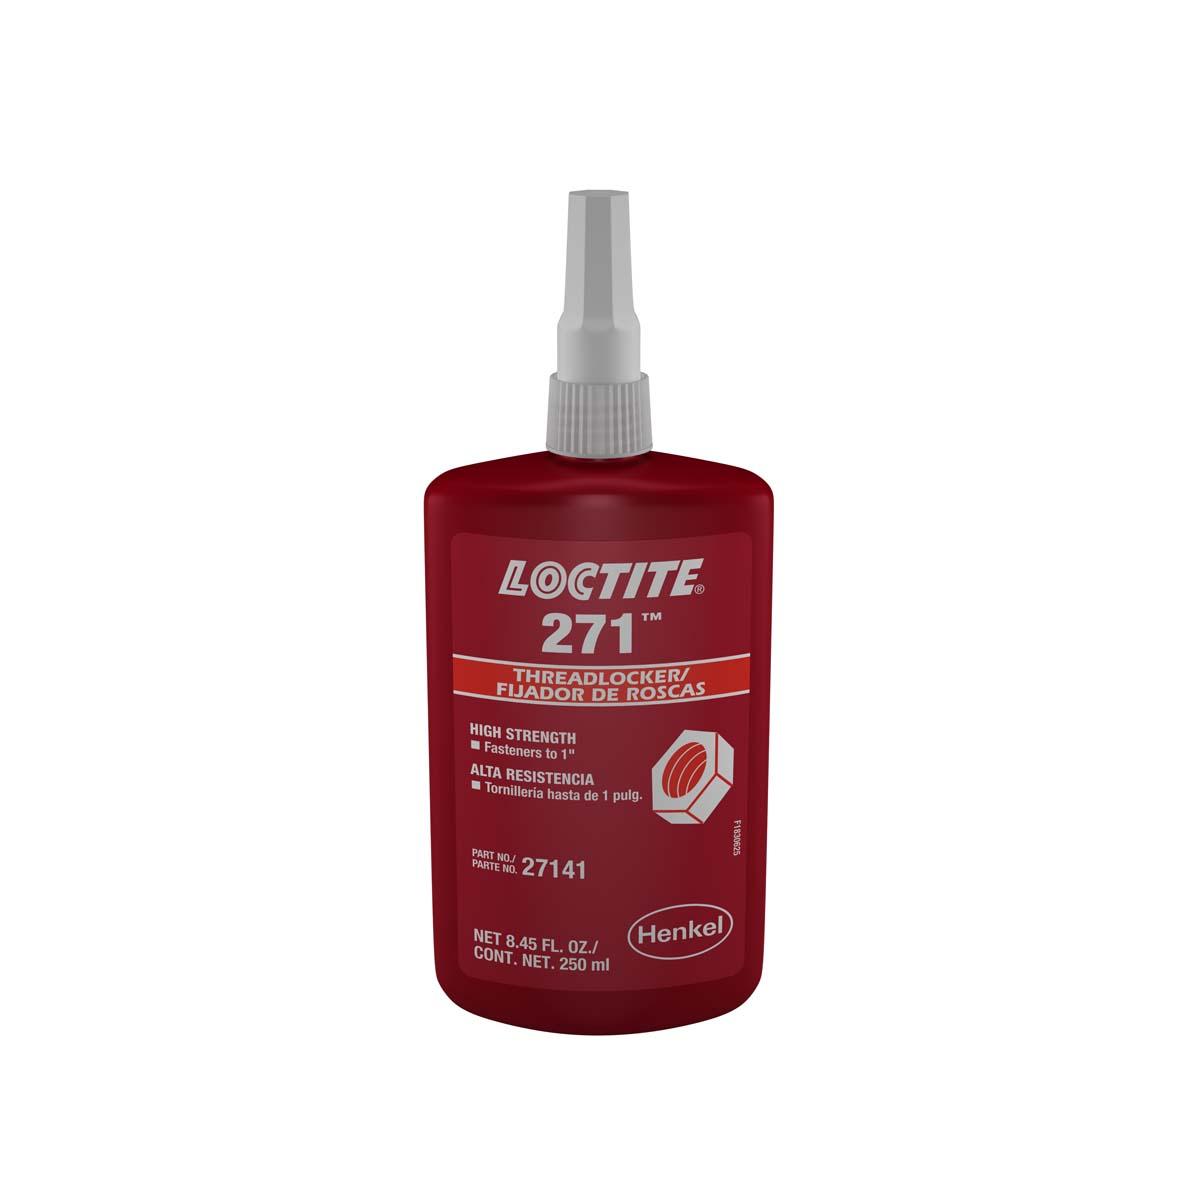 Loctite 271 High Strength Threadlocker